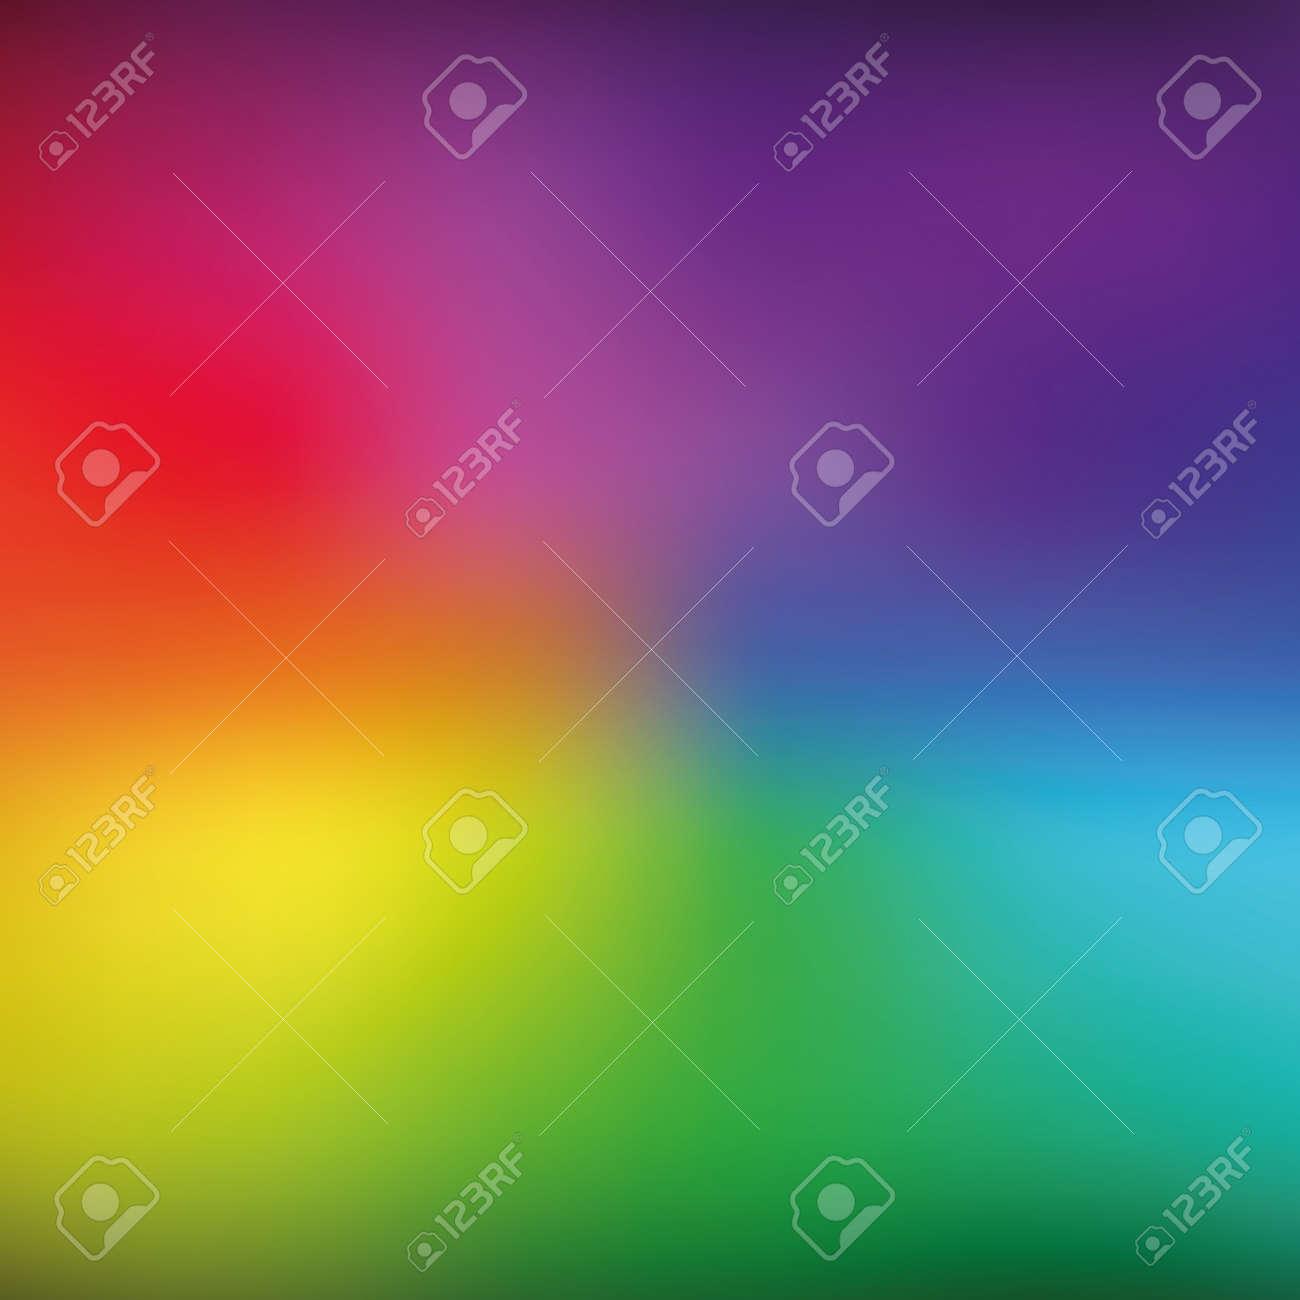 Bright rainbow mesh vector background. Eps 10 illustration Stock Vector - 88185319